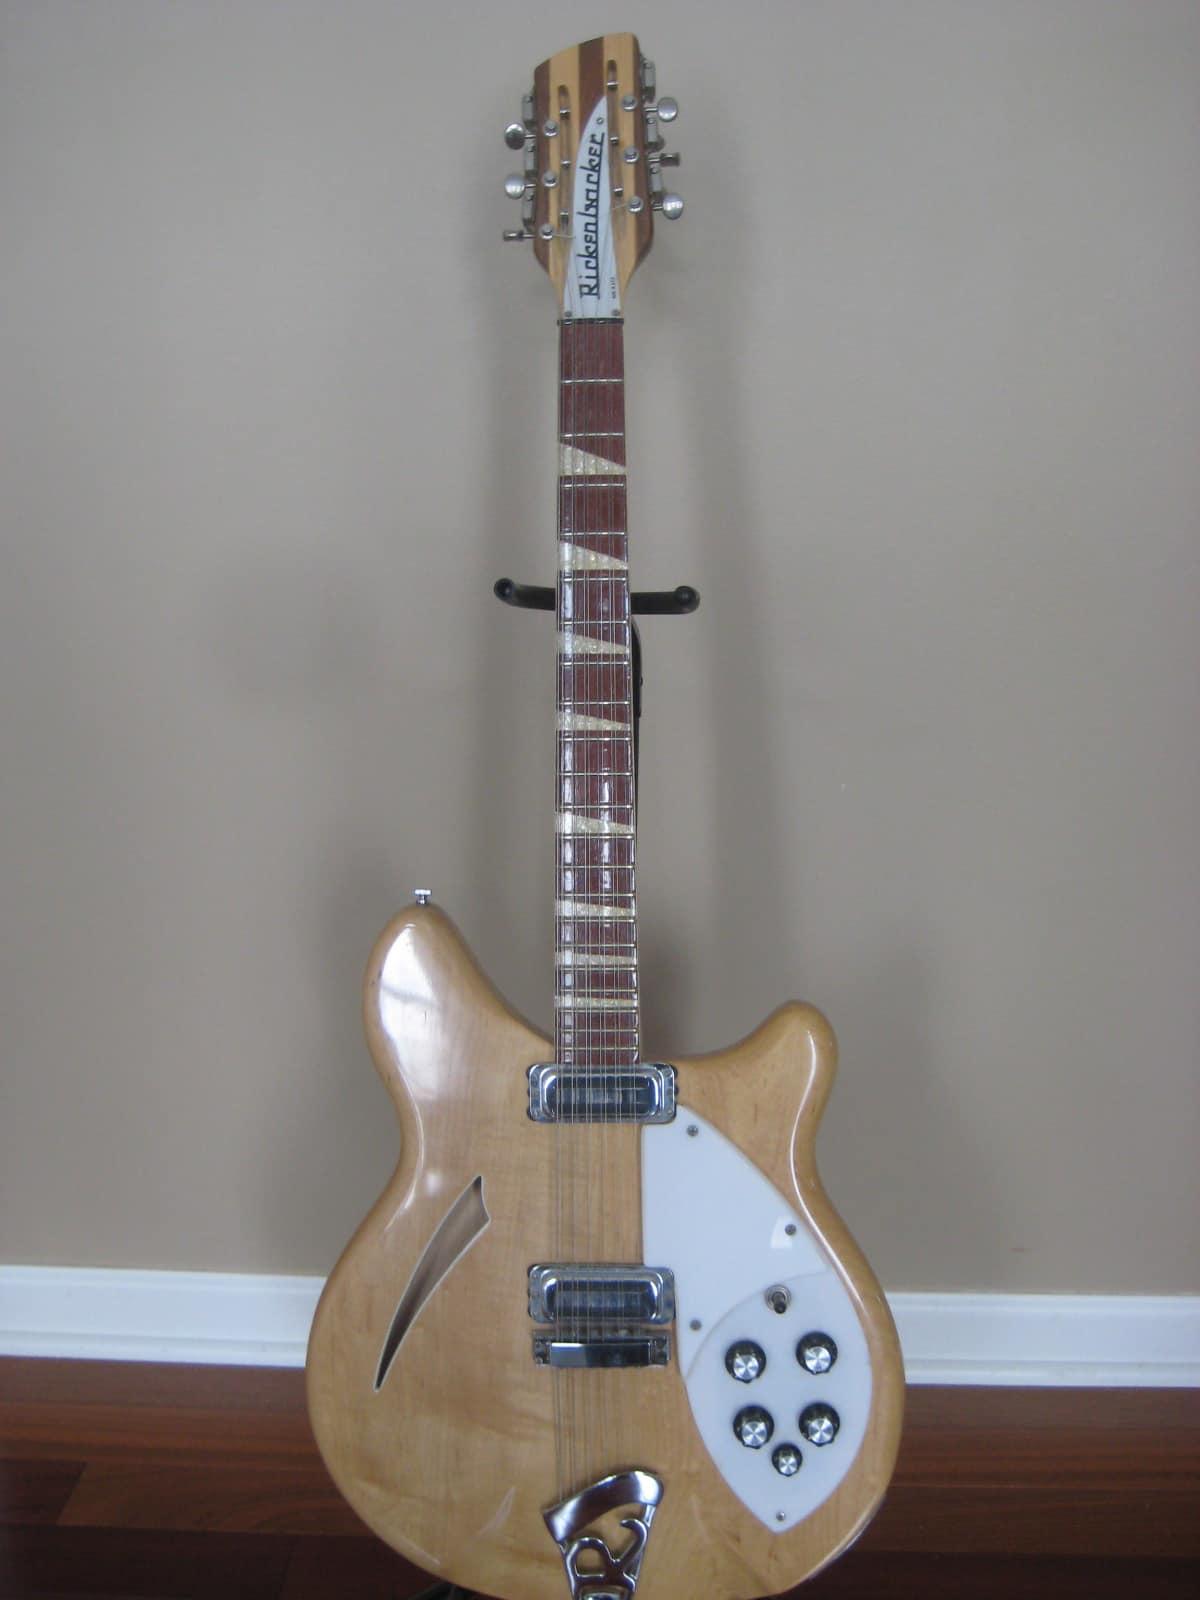 rickenbacker 360 12 1967 mapleglo papatim guitars reverb. Black Bedroom Furniture Sets. Home Design Ideas